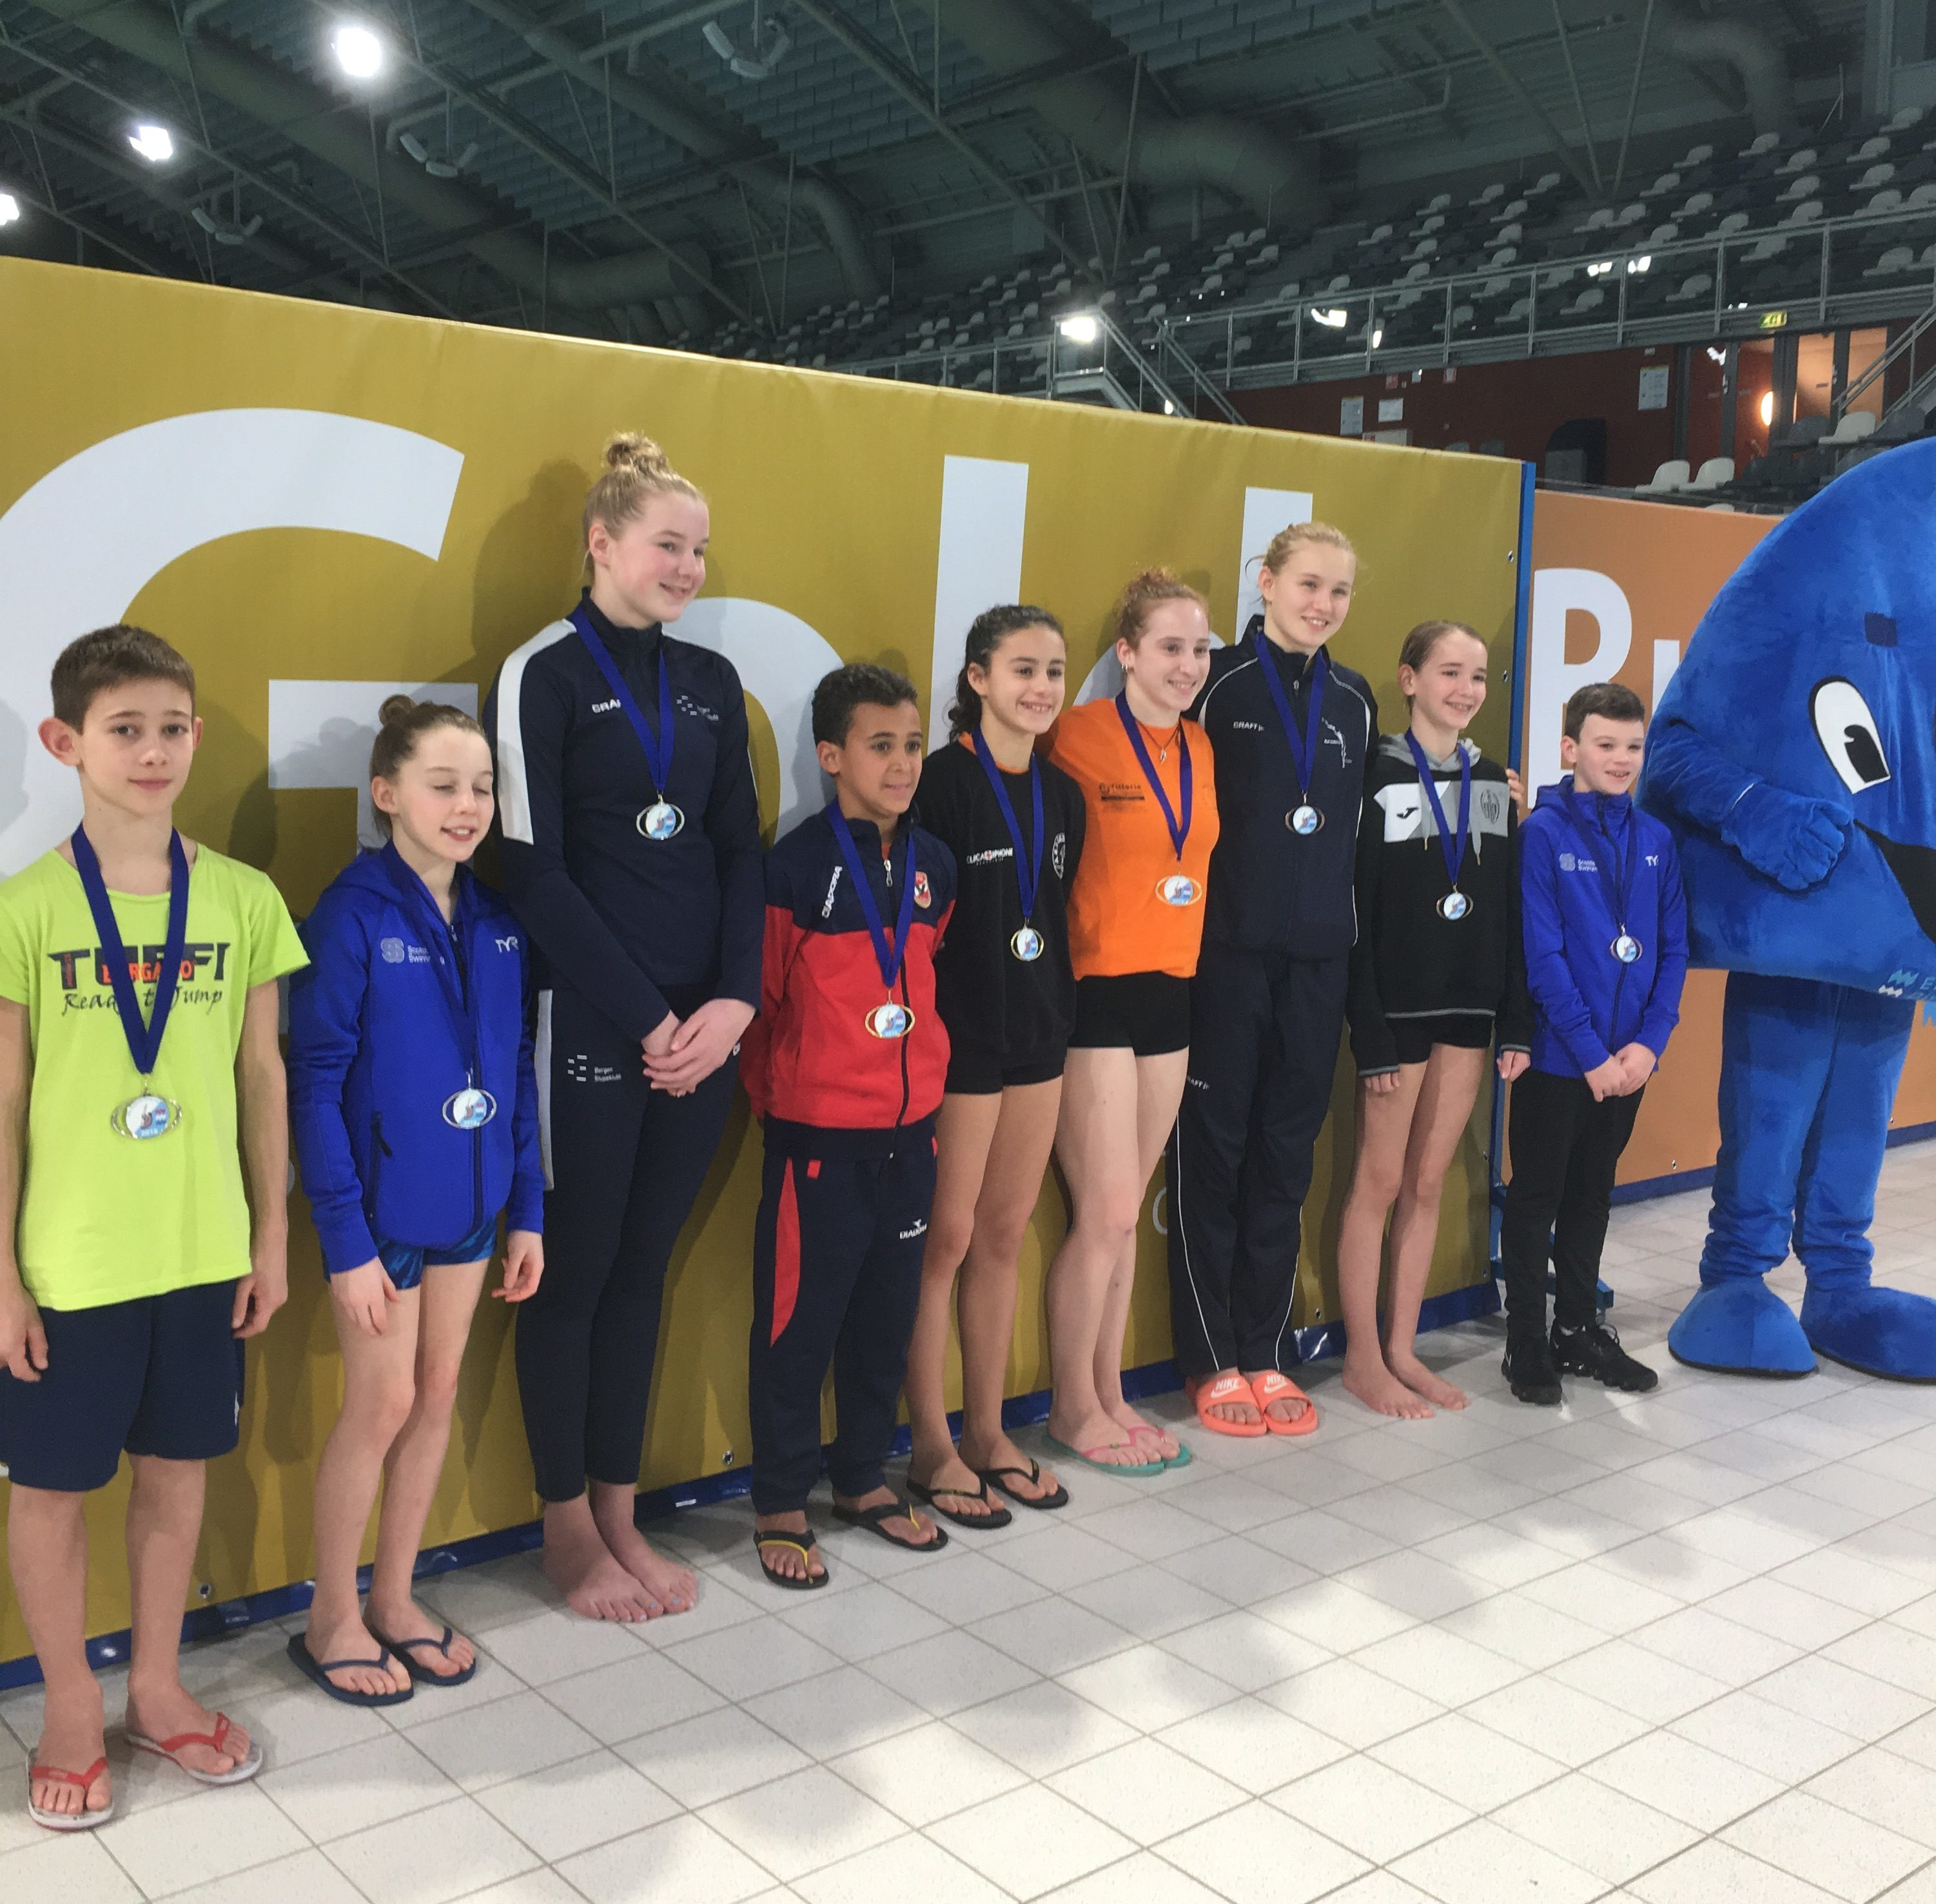 Medaille doda 31-1 Boys C Platform Girls A 1m Girls C 3m (3)